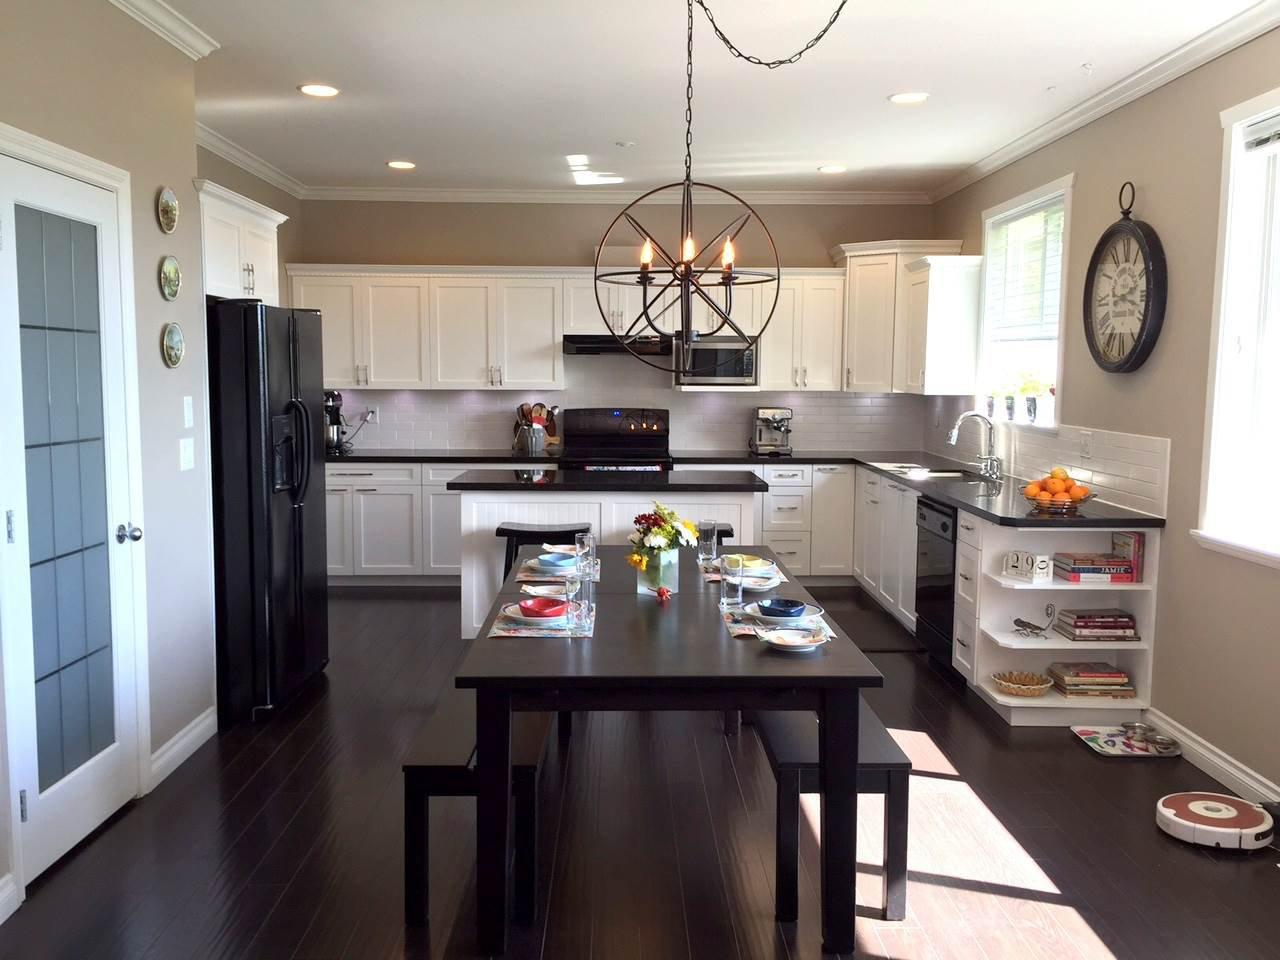 Photo 6: Photos: 24332 104 AVENUE in Maple Ridge: Albion House for sale : MLS®# R2051414